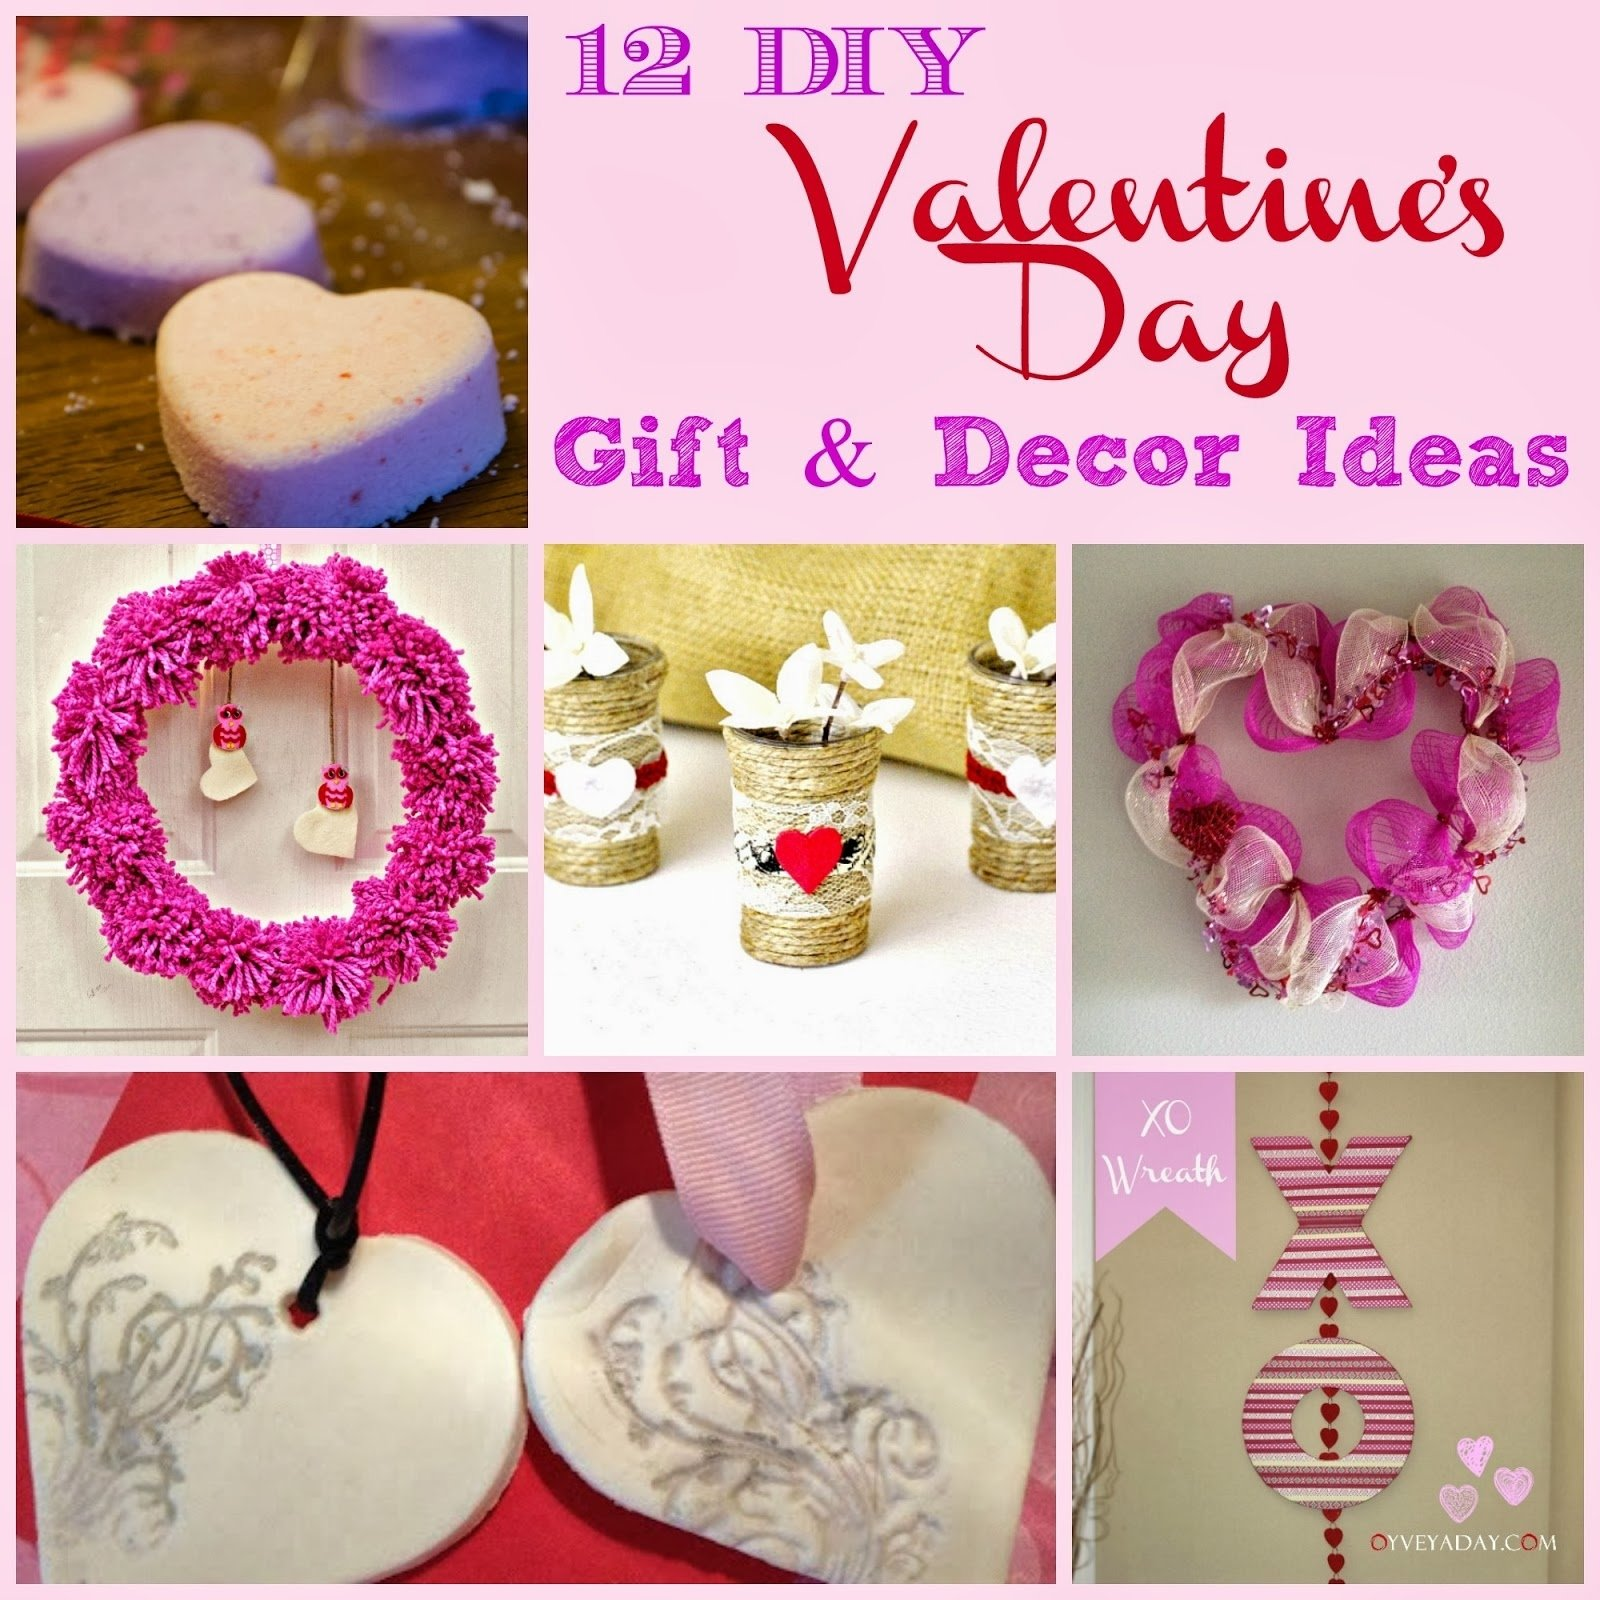 10 Amazing Crafts For Valentines Day Ideas 12 diy valentines day gift decor ideas diys 1 2020